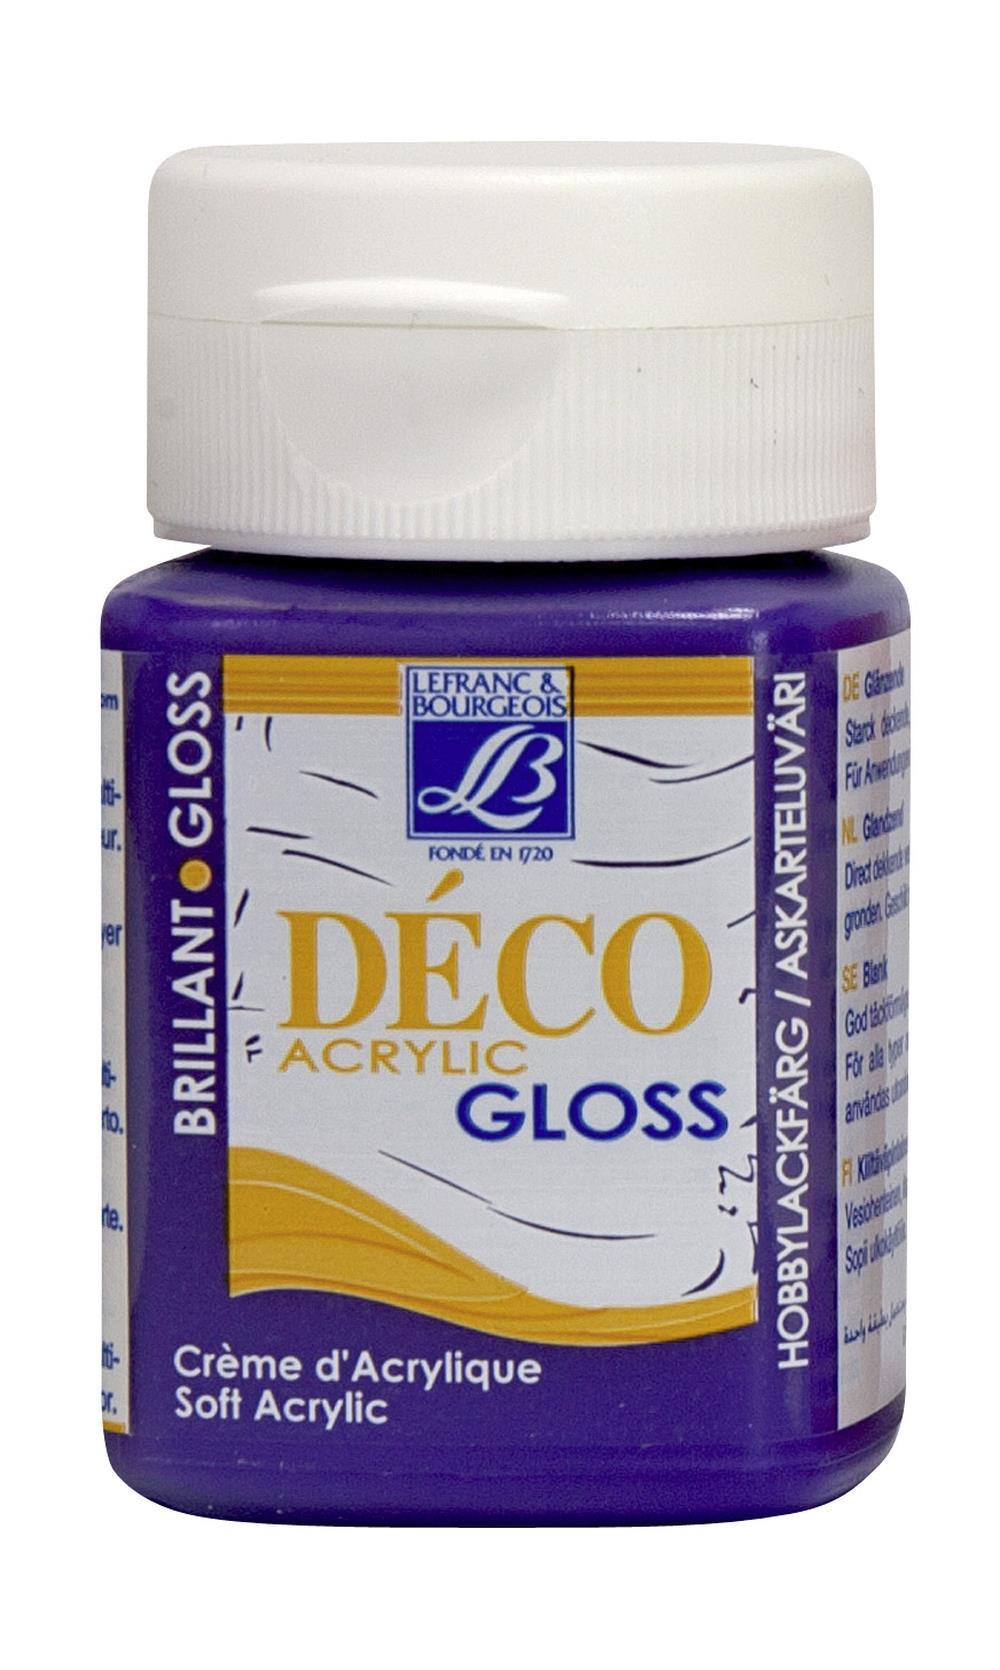 Hobbyfärg L&B Deco Gloss Akryl 50ml  Violet cream 601 (4F) Utgår